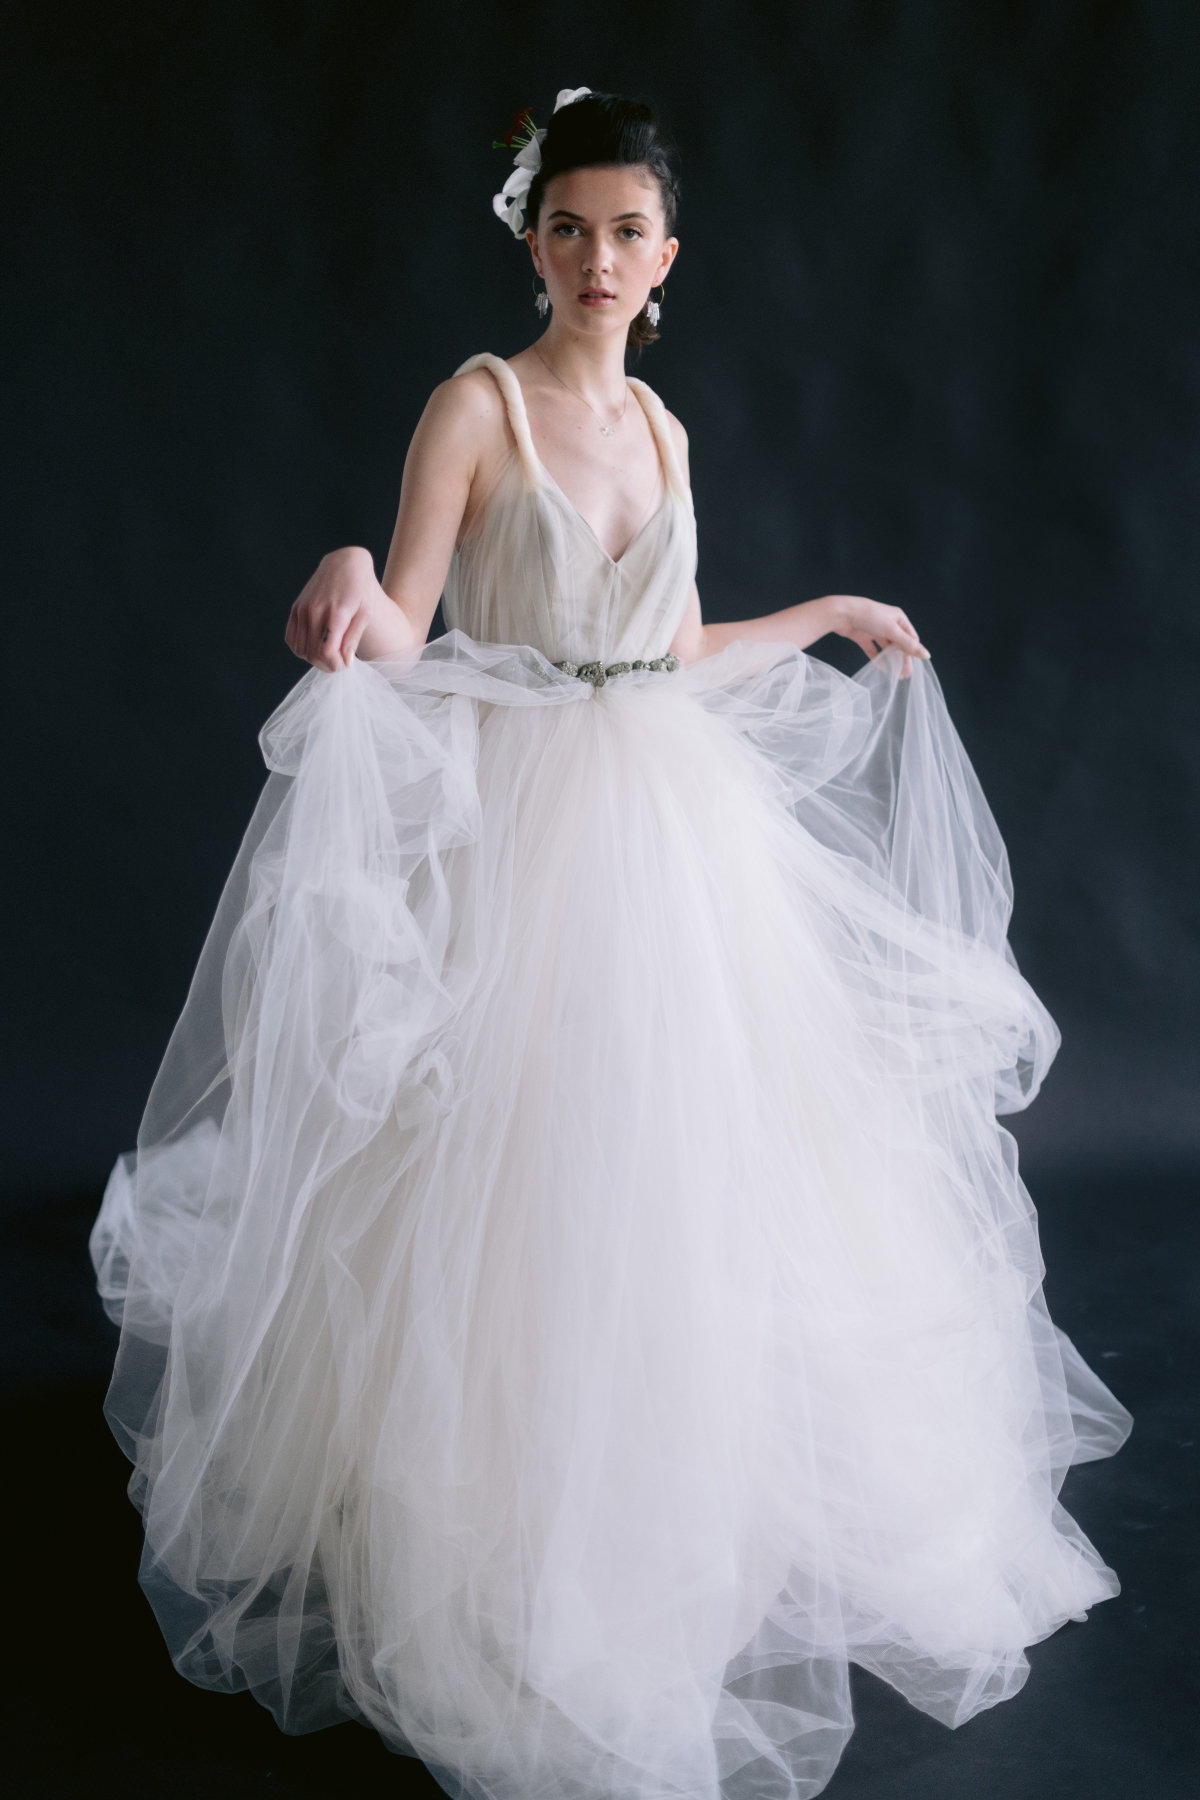 Laura Lanzerotte Bridal Danielle Heinson Photography 69